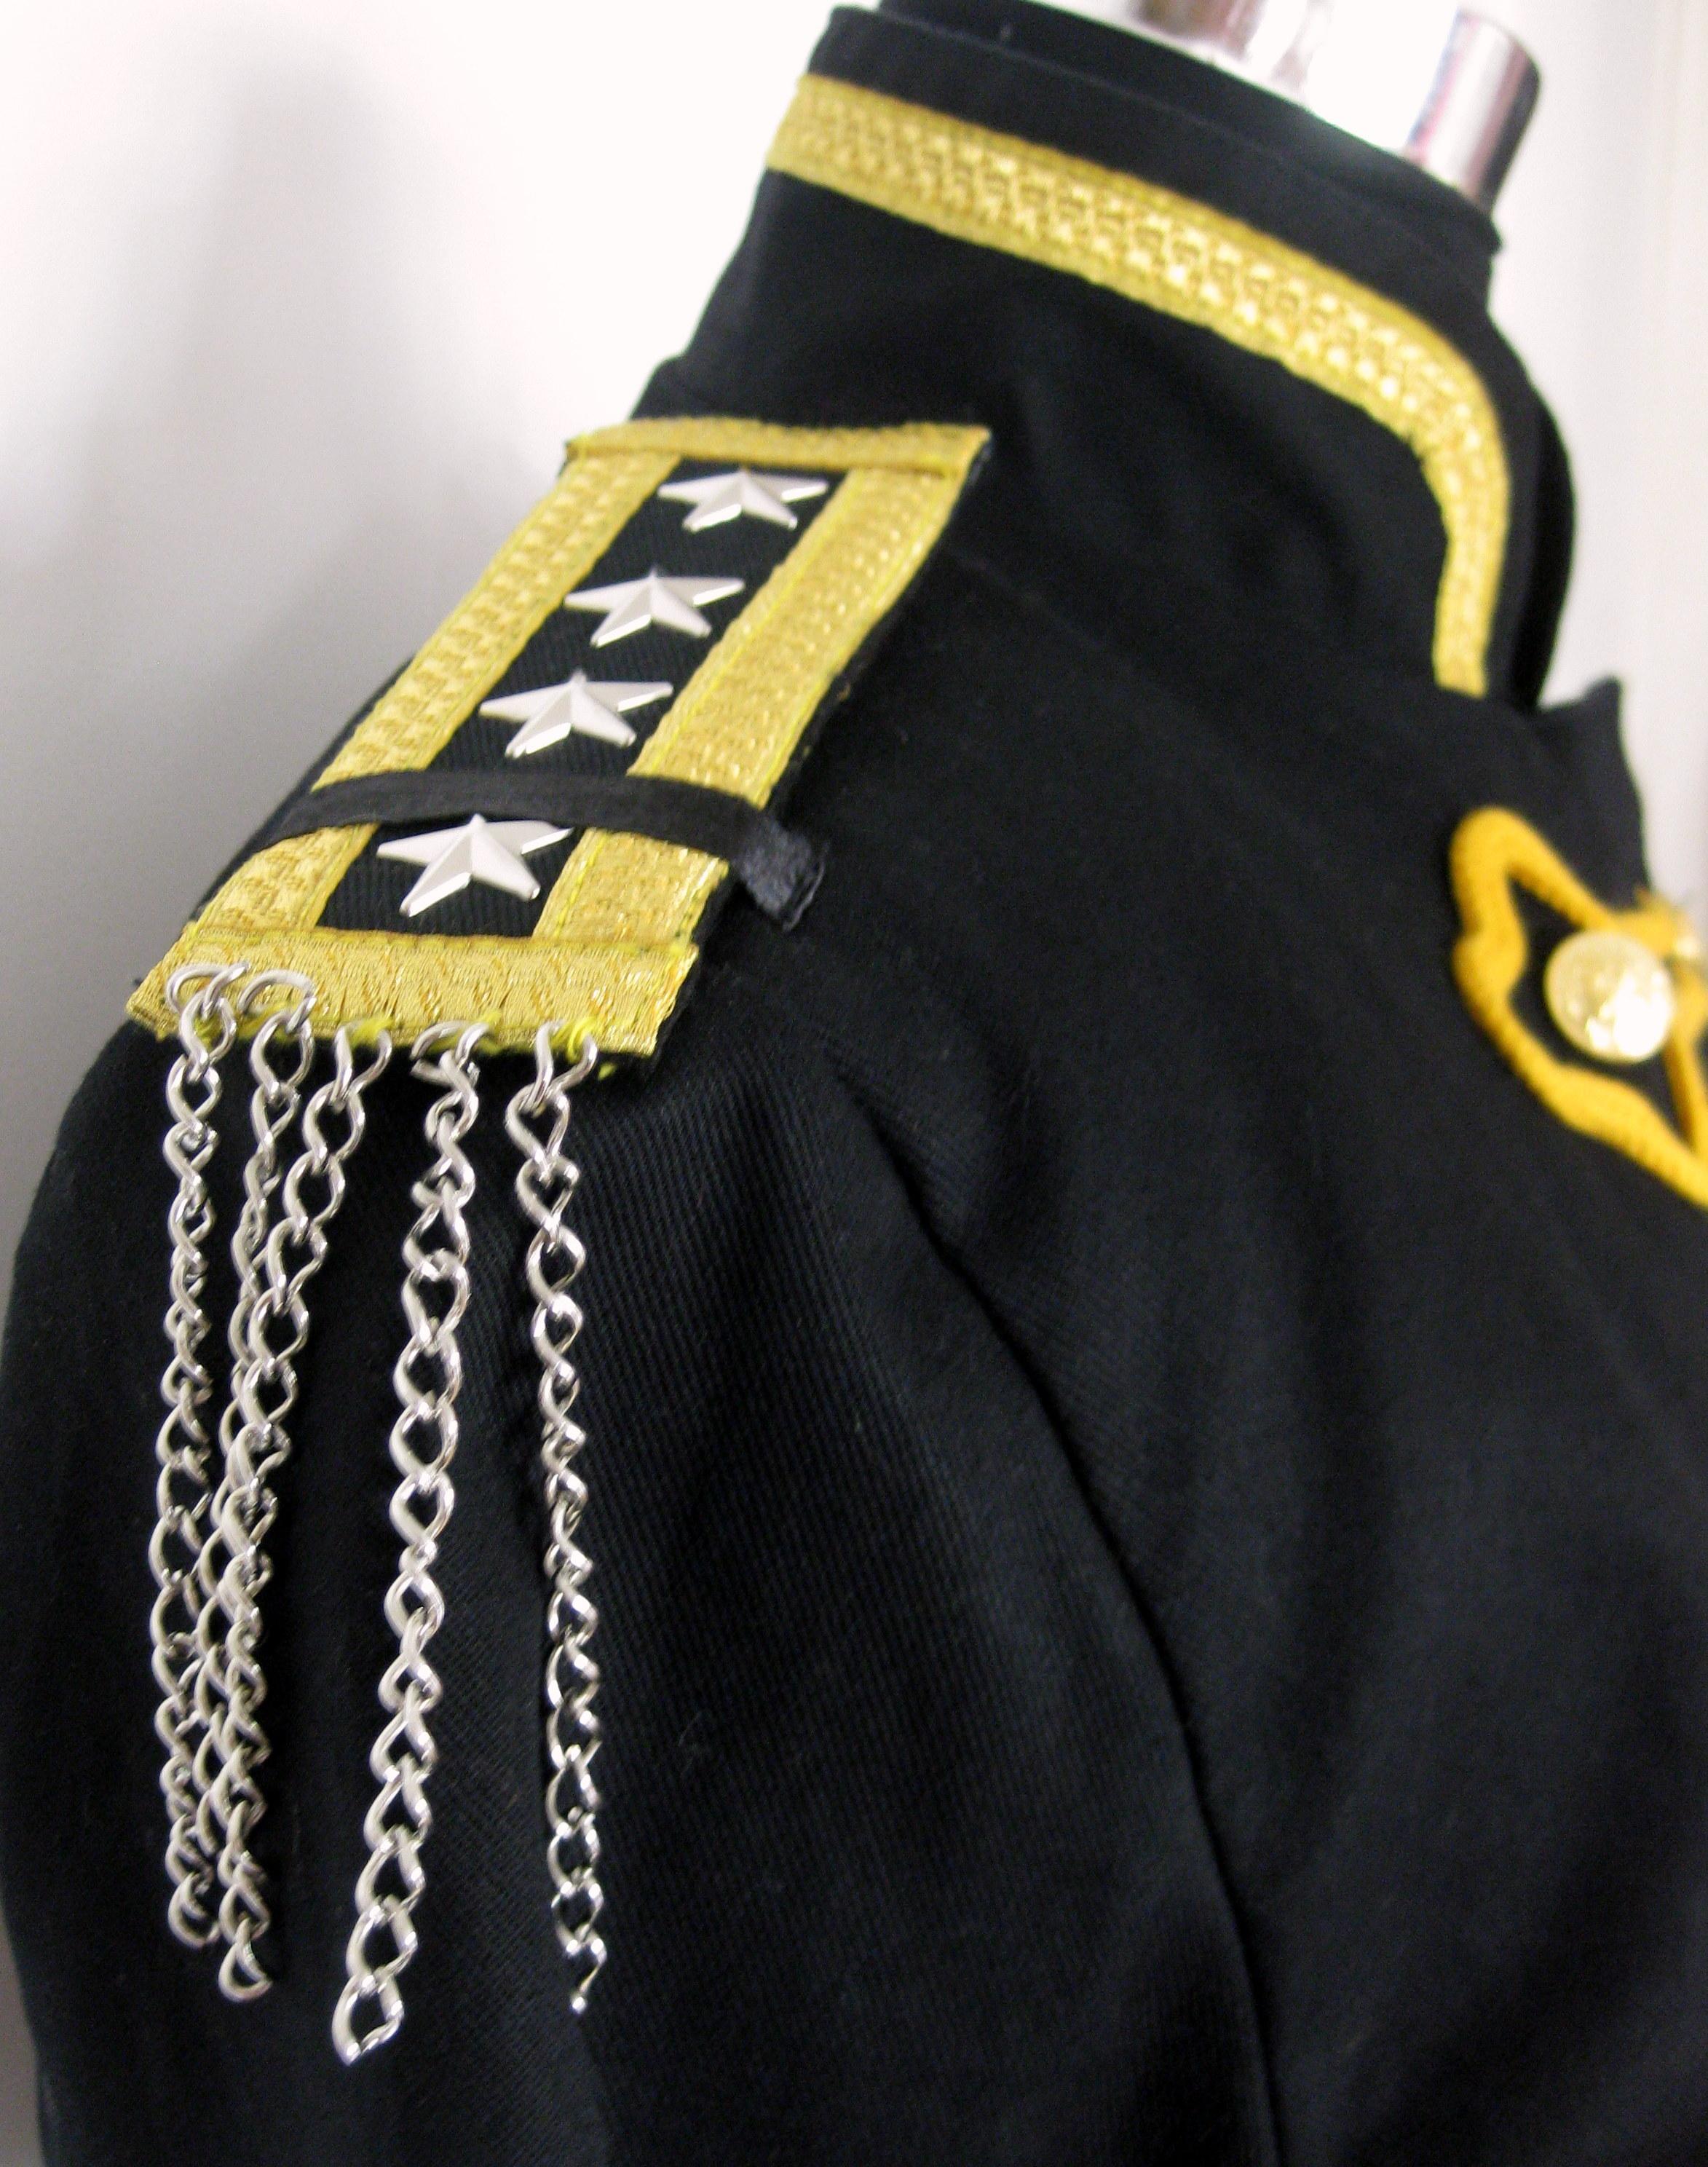 kendall_military_band_style_jacket_jackets_4.JPG